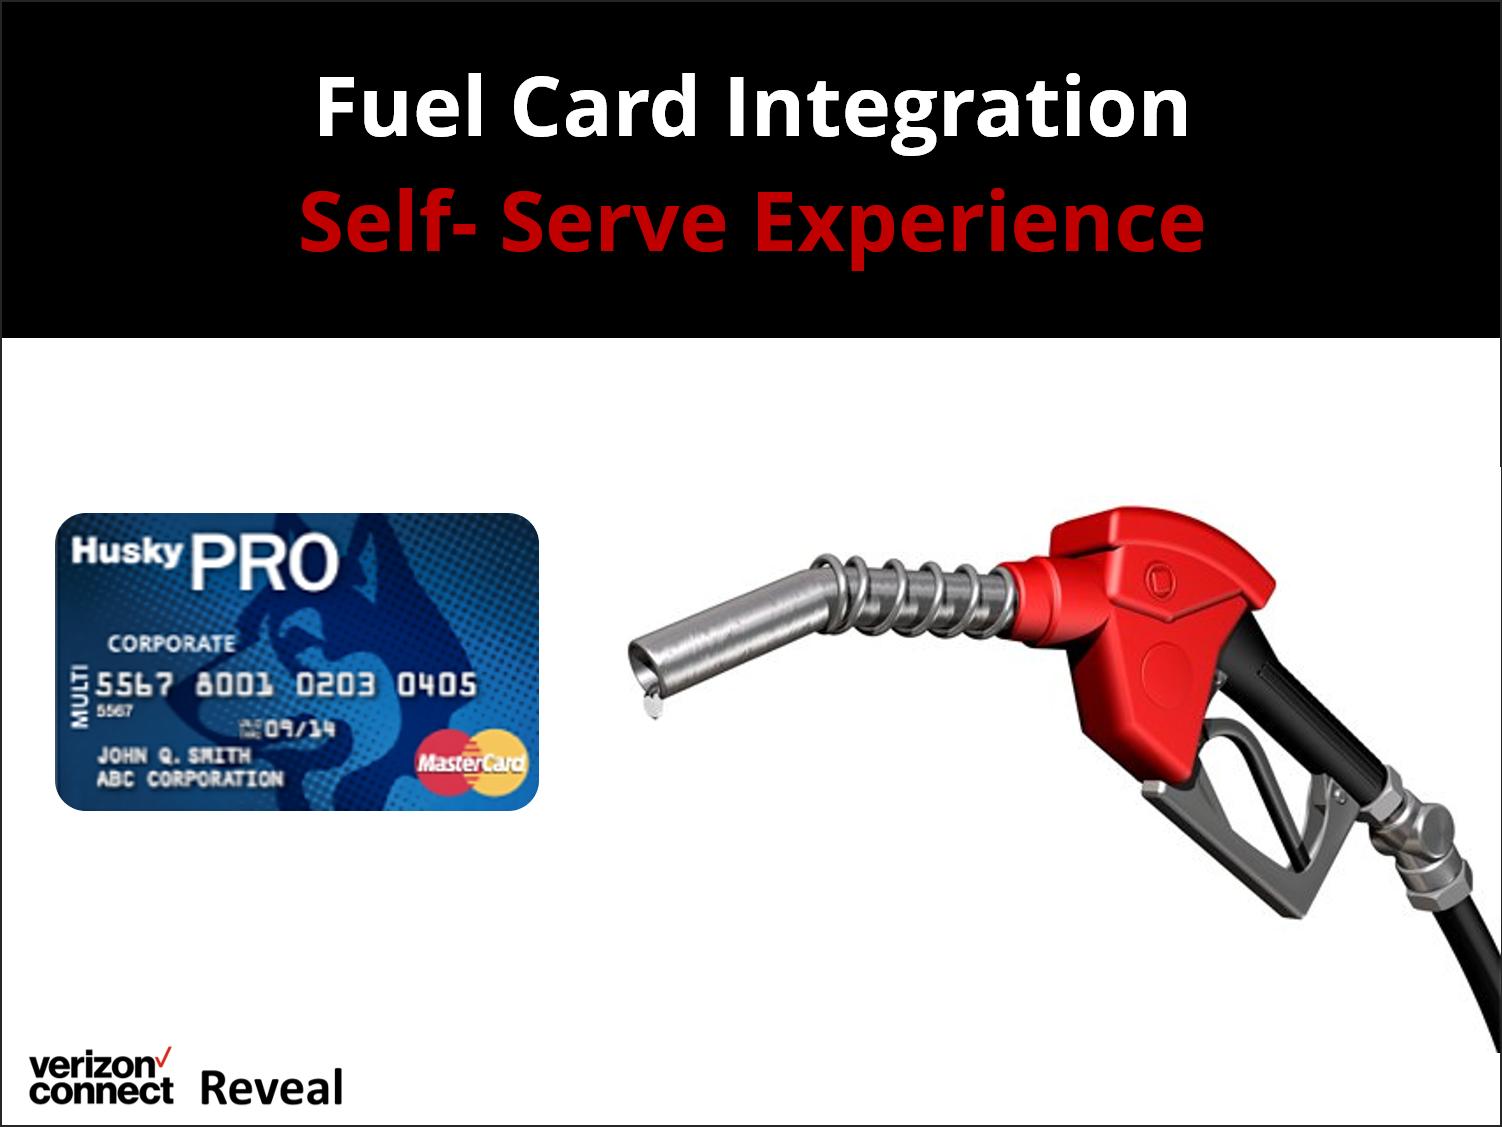 Reveal Fuel Card Integration Self-Serve Experience eTutorial